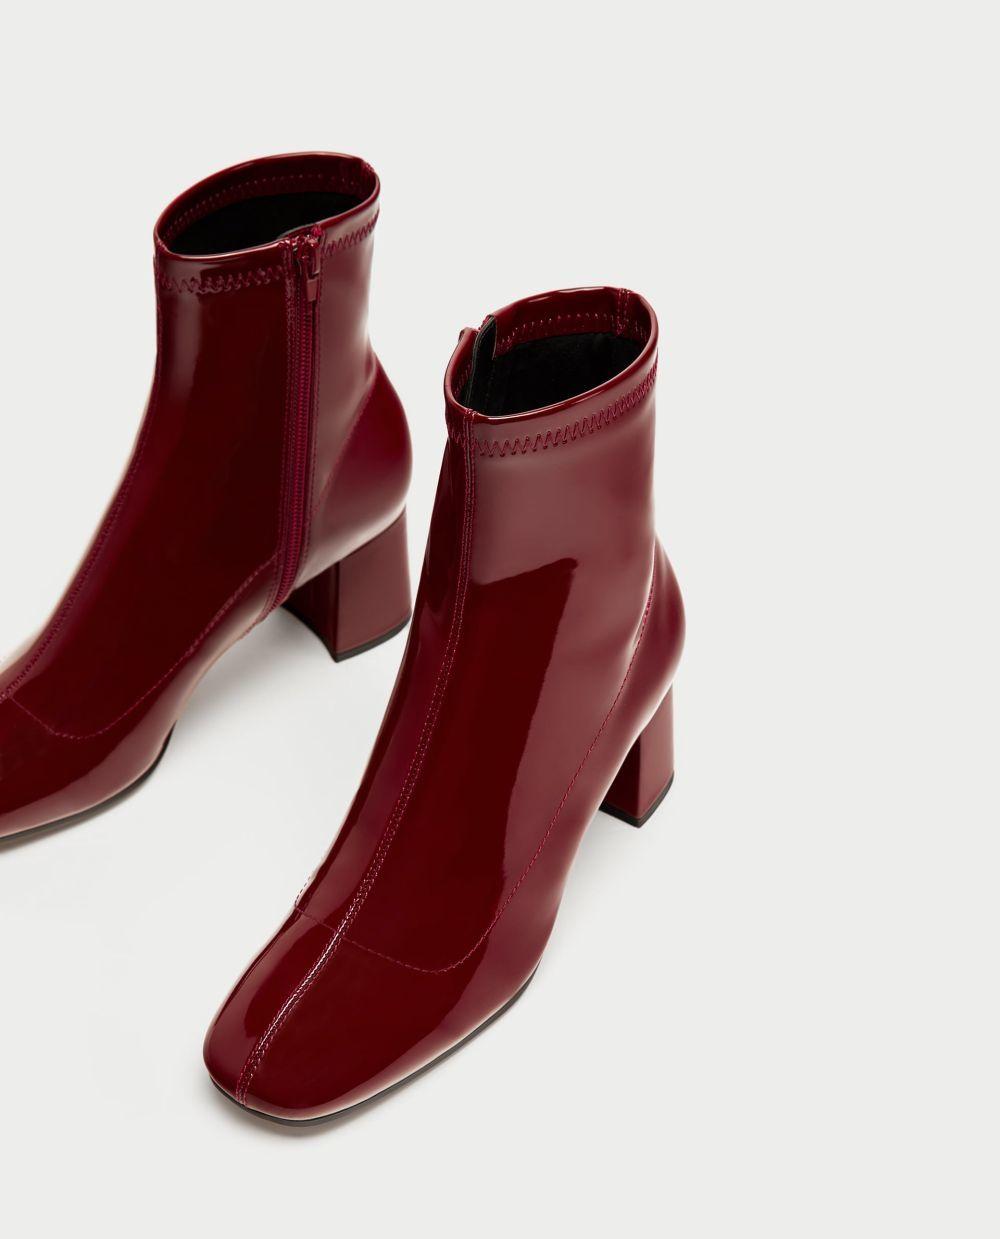 Botas de charol rojas de Zara (29,95 euros)